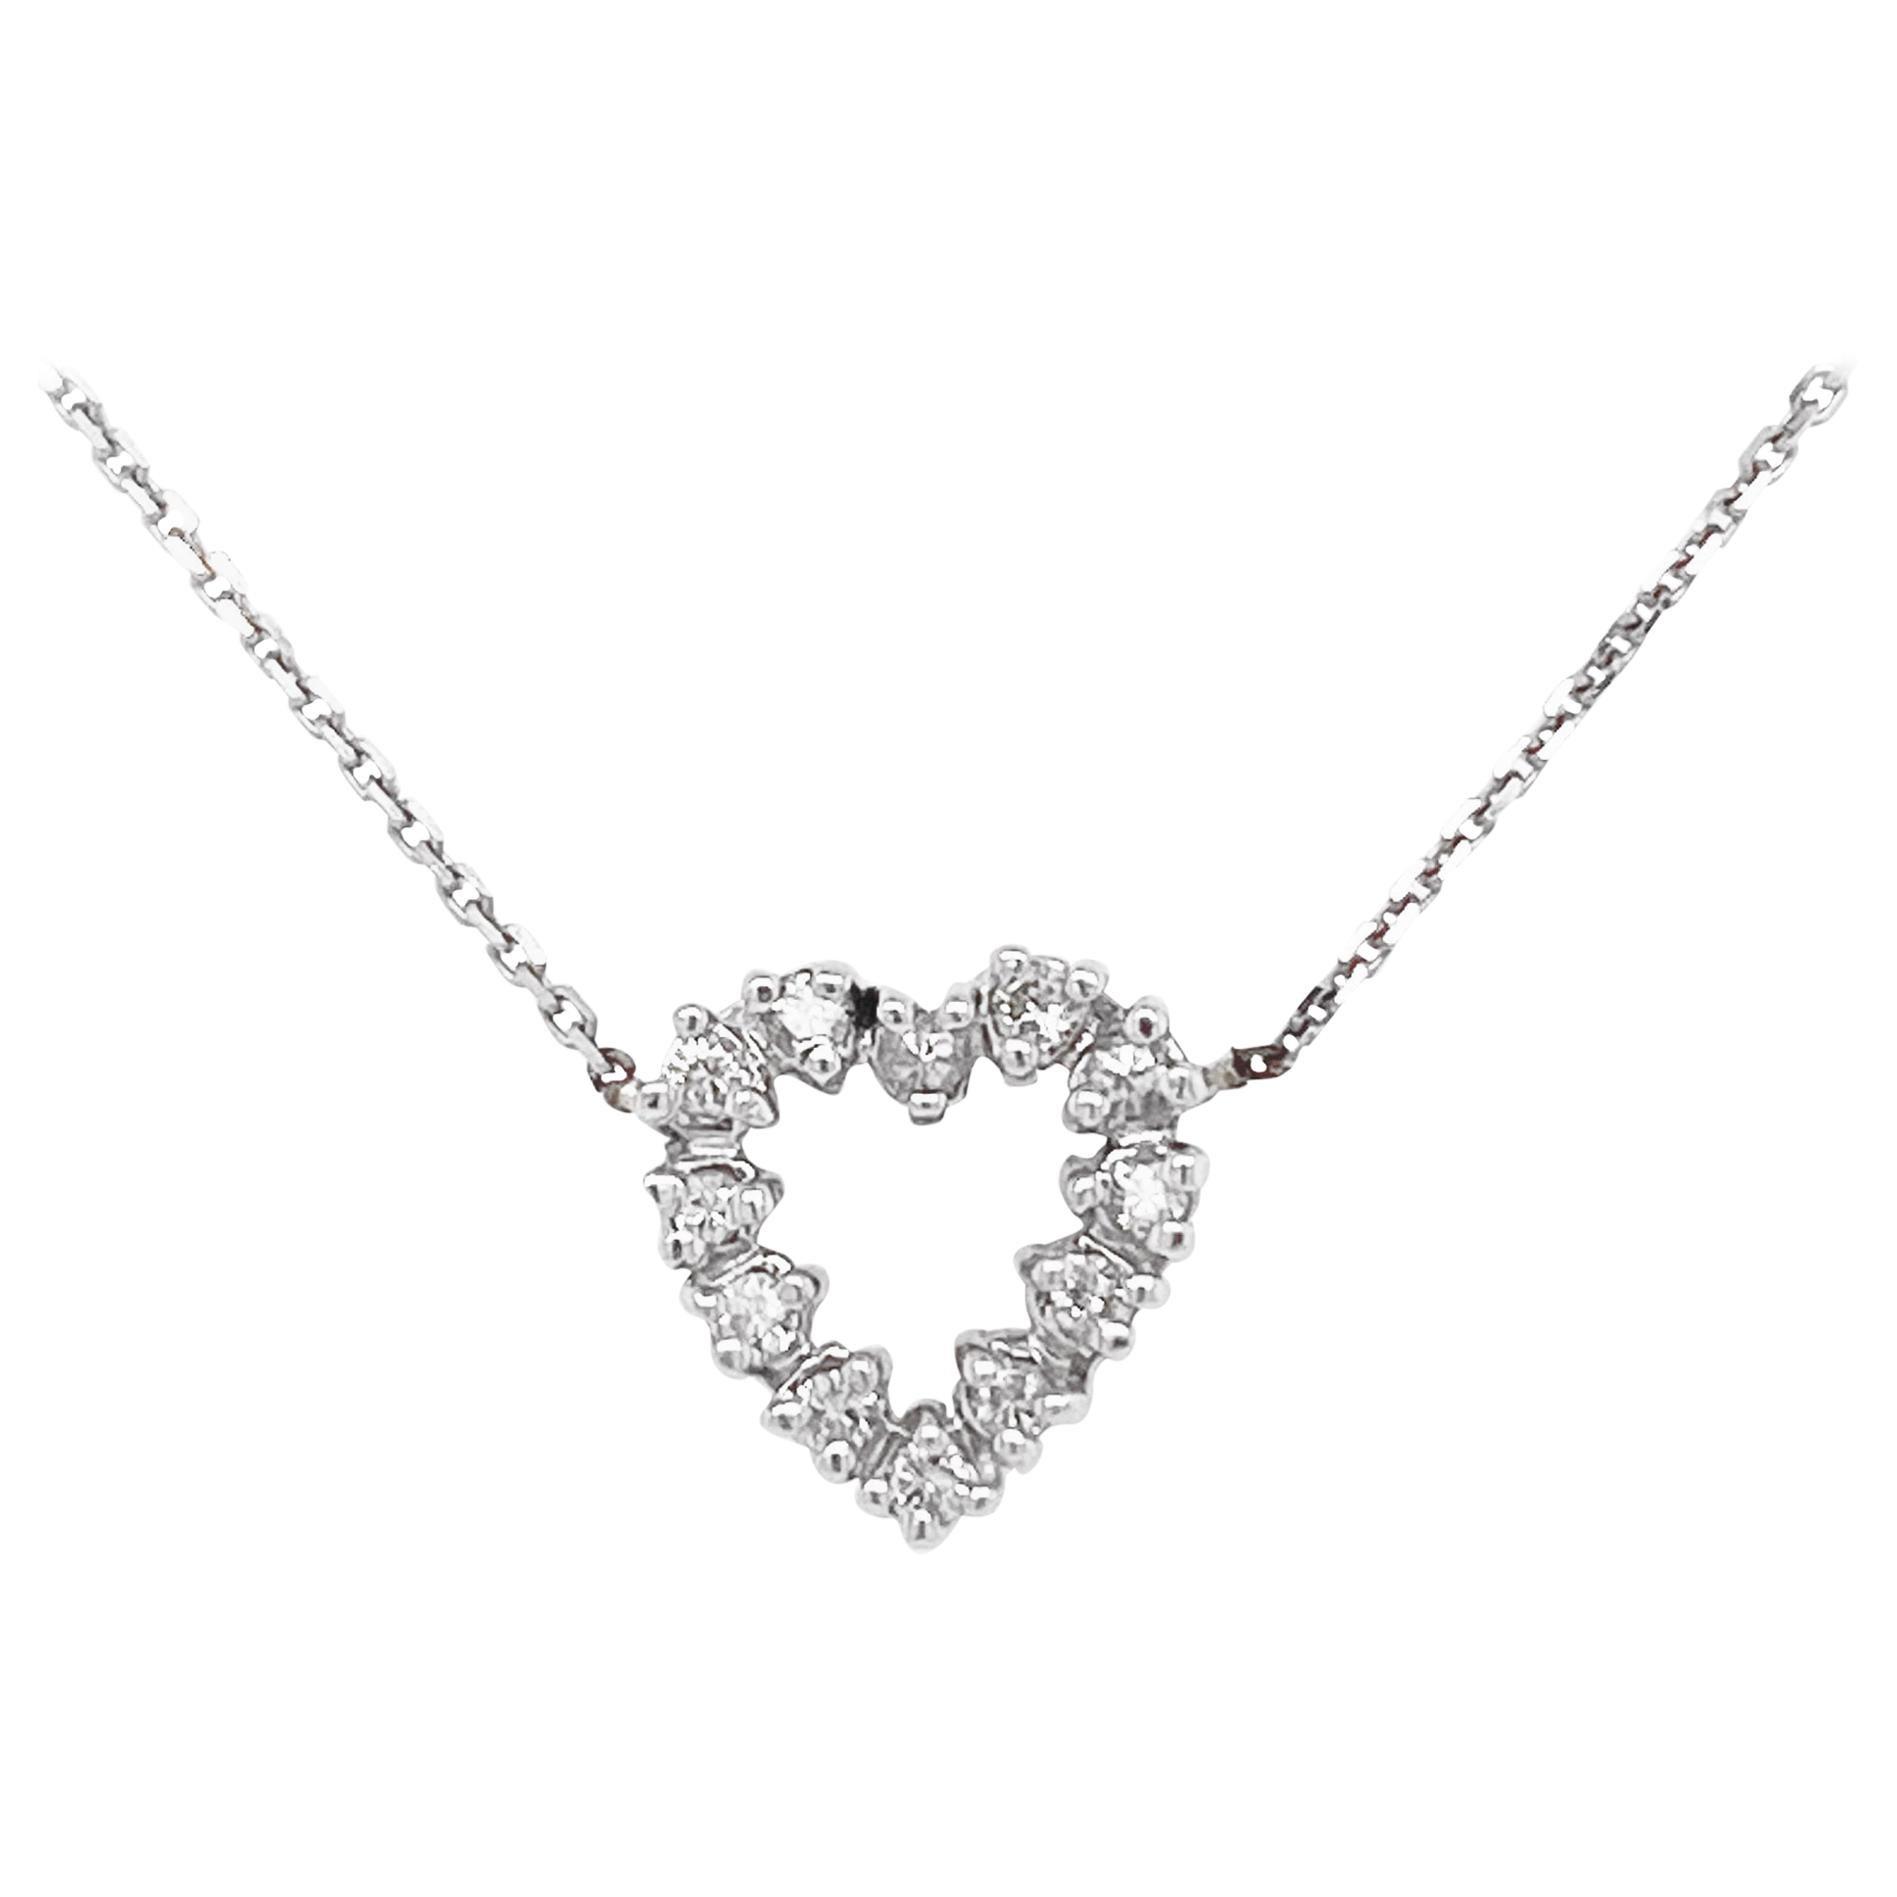 Diamond Heart Necklace, White Gold Pavé Diamond Open Heart, Romantic Heart